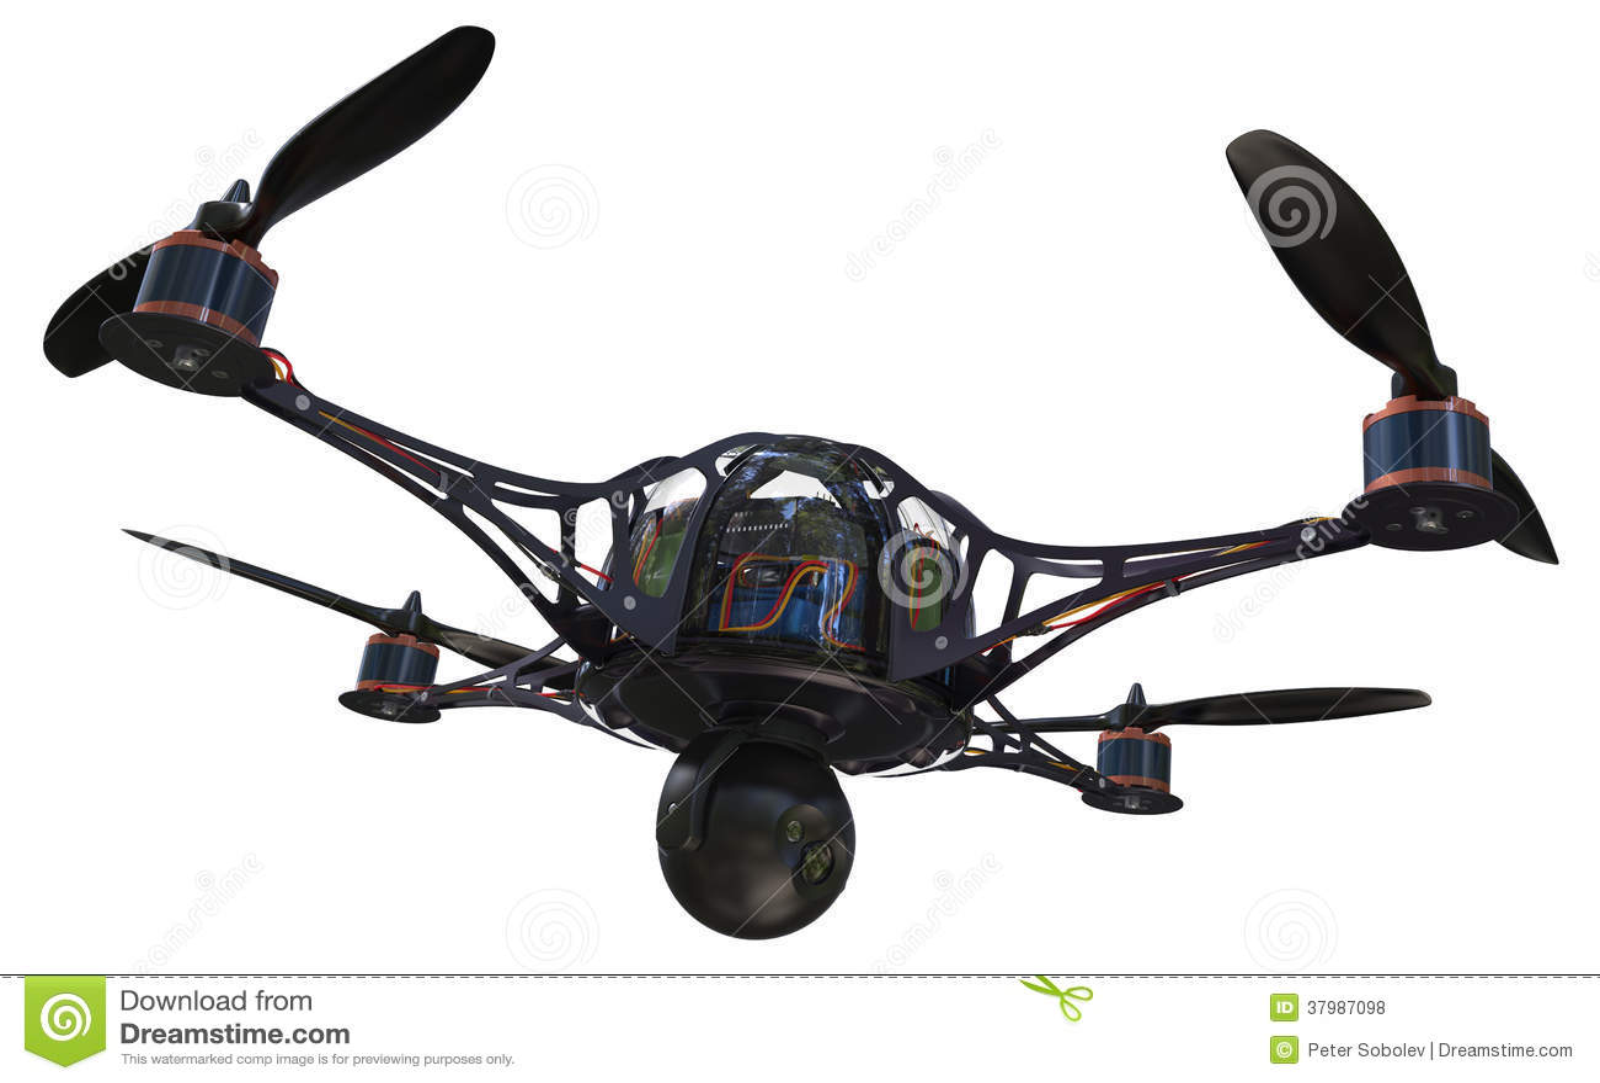 quadrocopter mit kamera lizenzfreie stockfotos bild 37987098. Black Bedroom Furniture Sets. Home Design Ideas